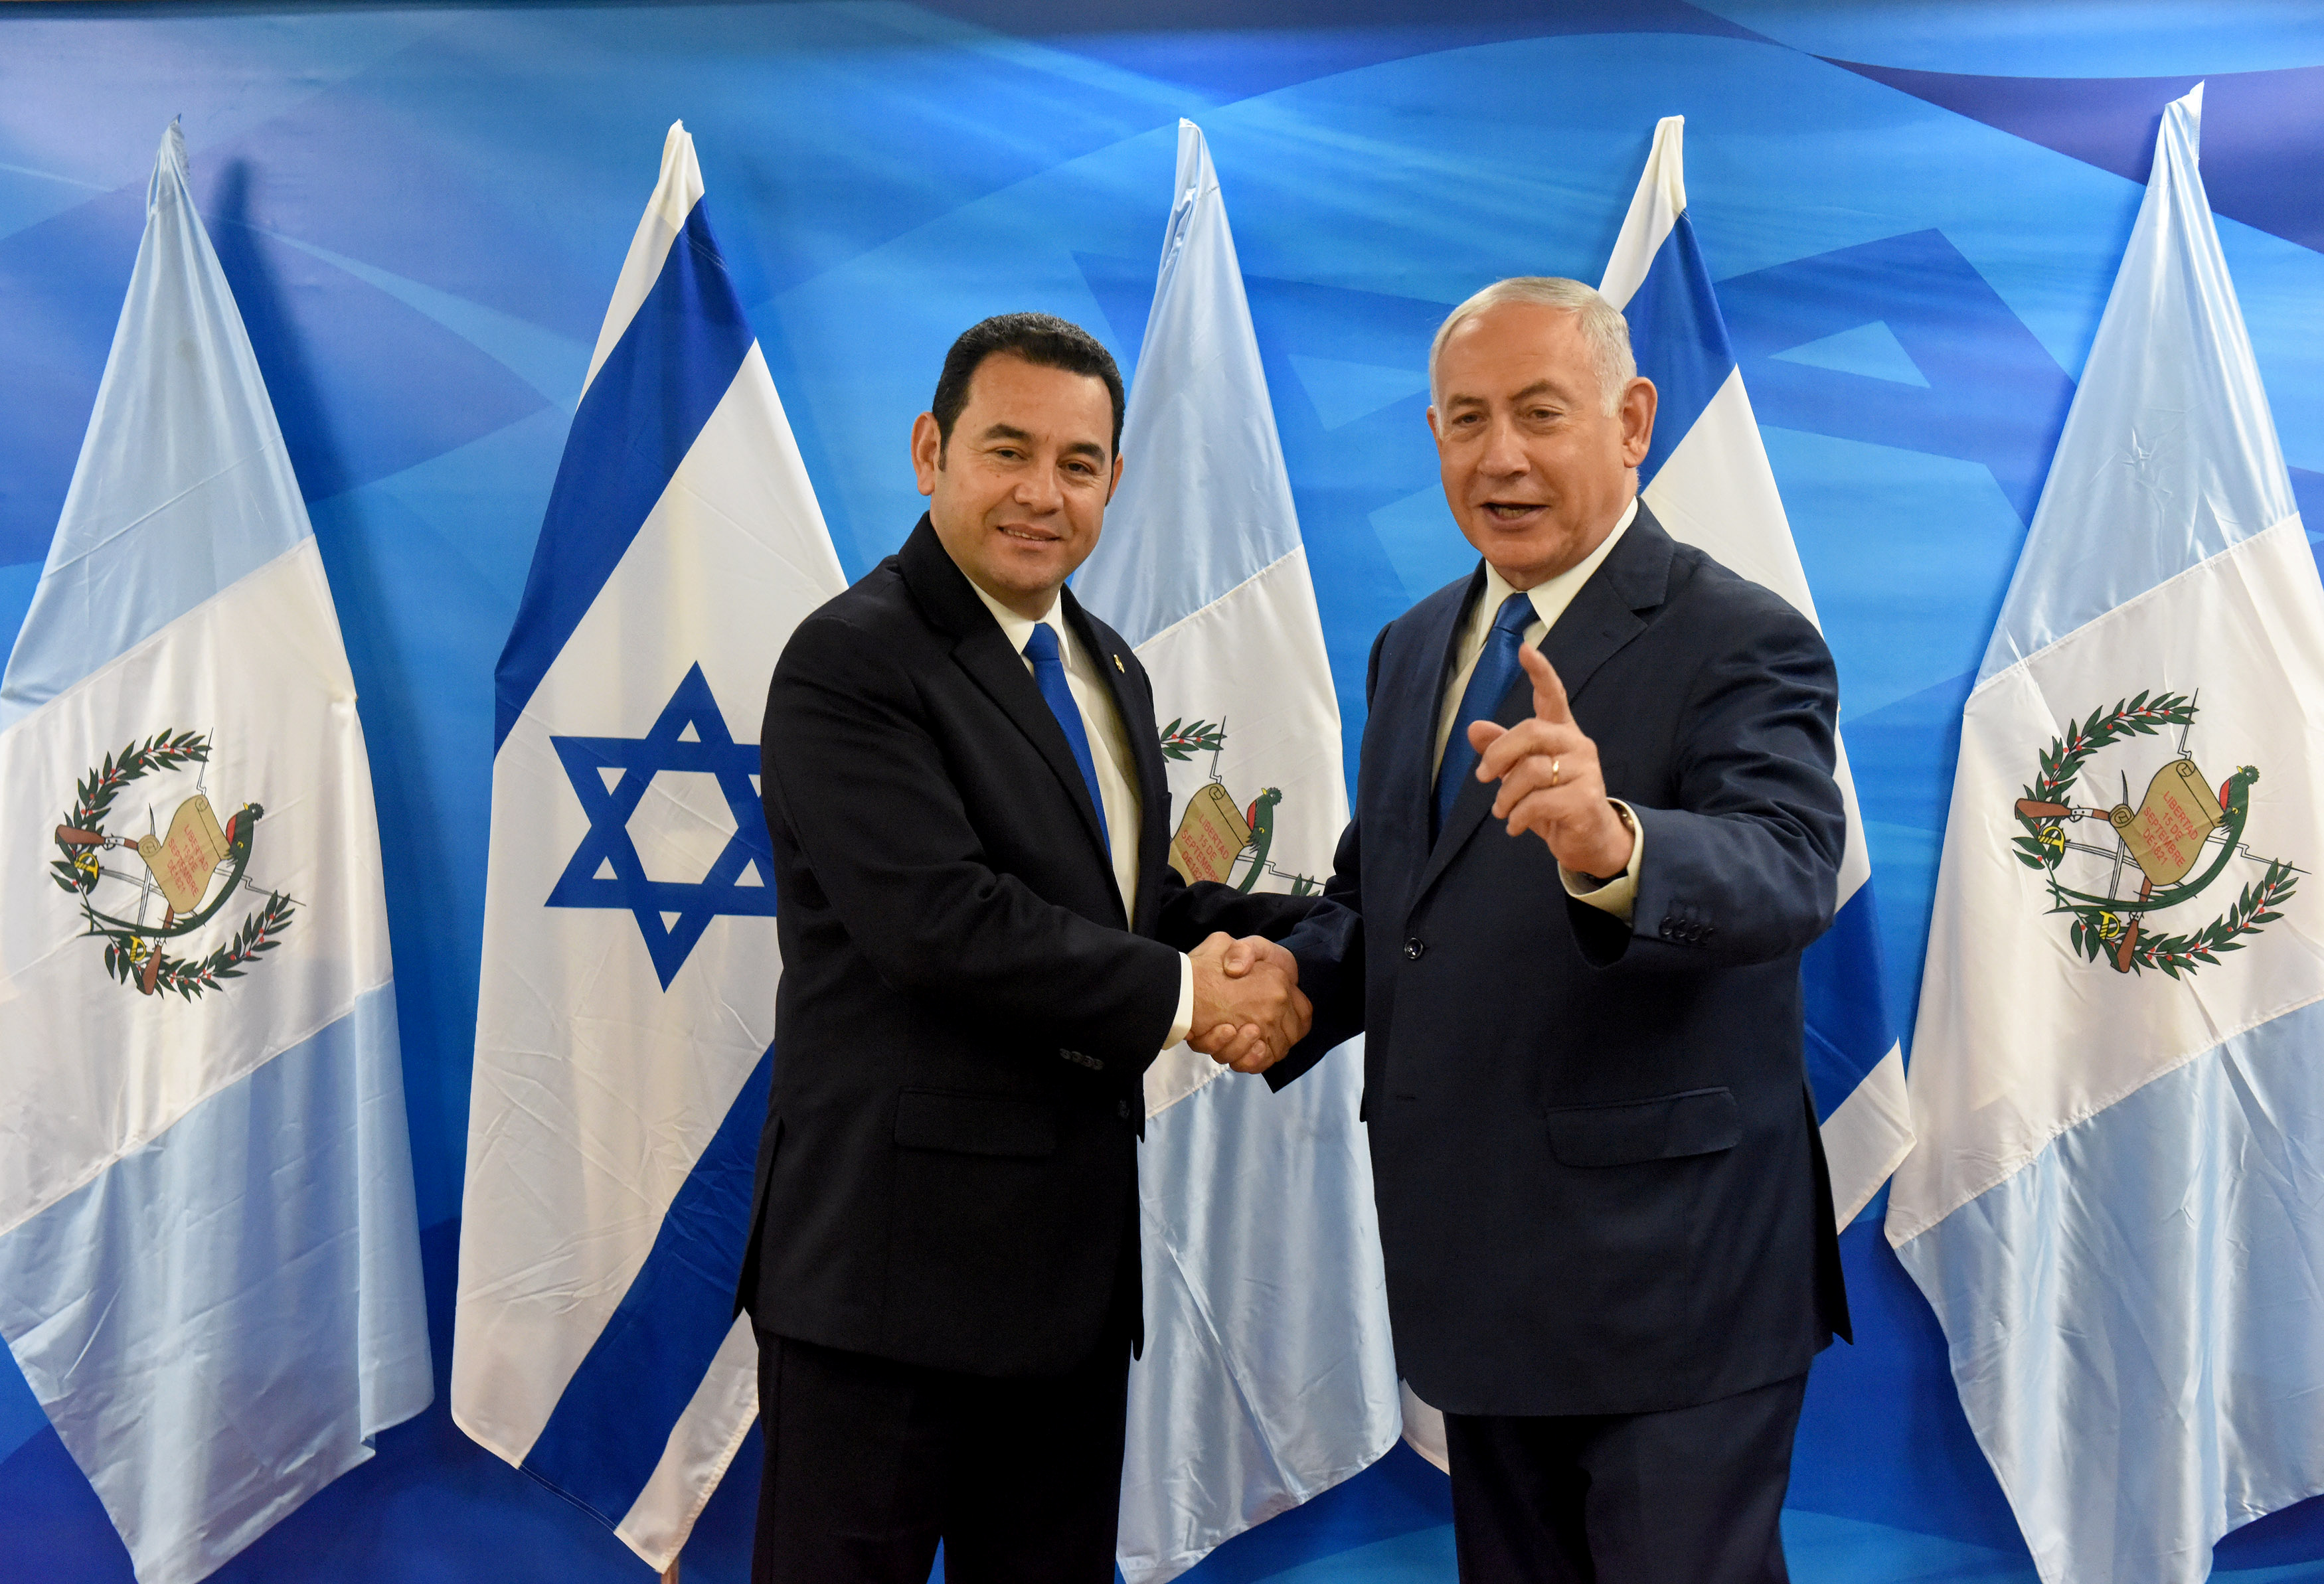 Liga Árabe finiquita cooperación con Guatemala tras apertura de embajada